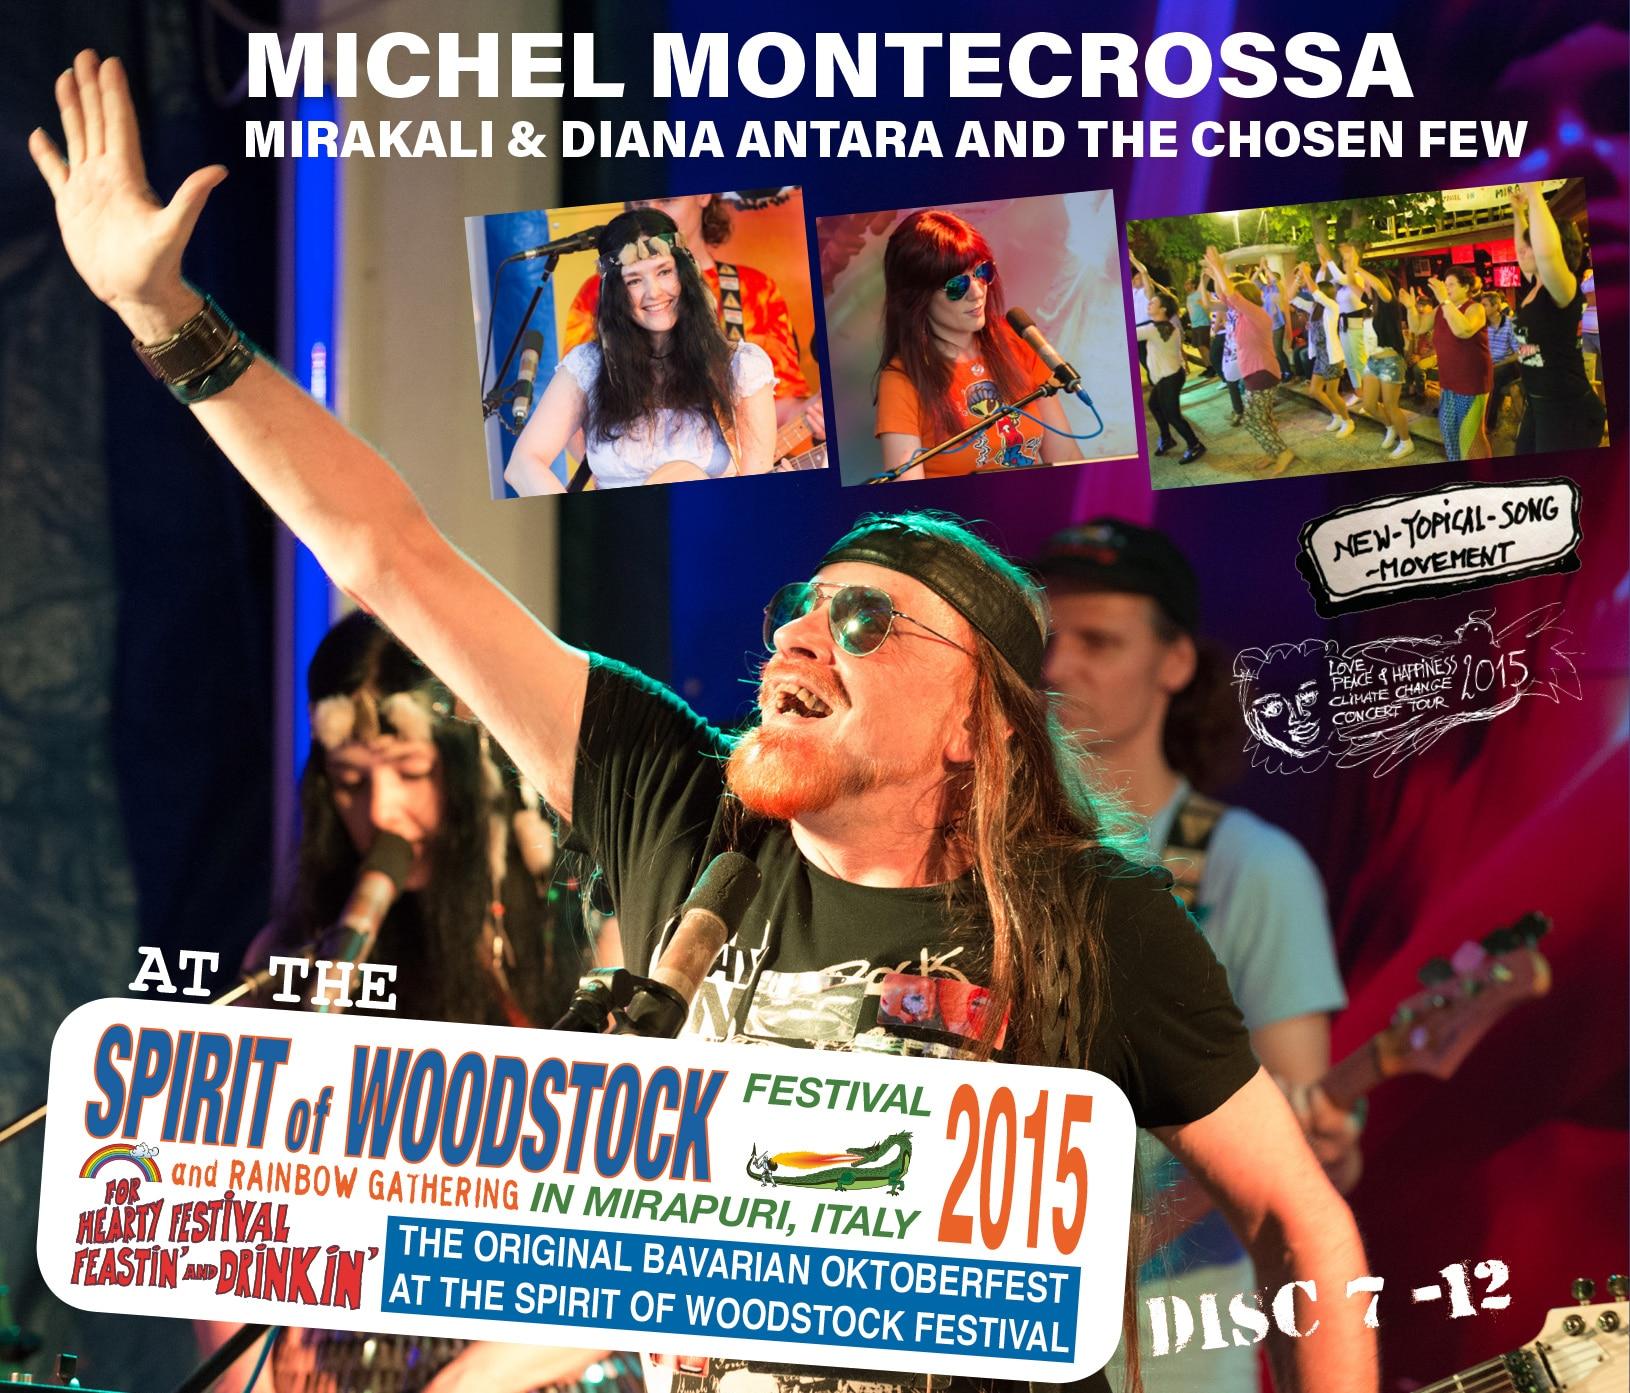 Michel Montecrossa, Mirakali and Diana Antara at the Spirit of Woodstock Festival 2015 in Mirapuri, Italy - Disc 7-12